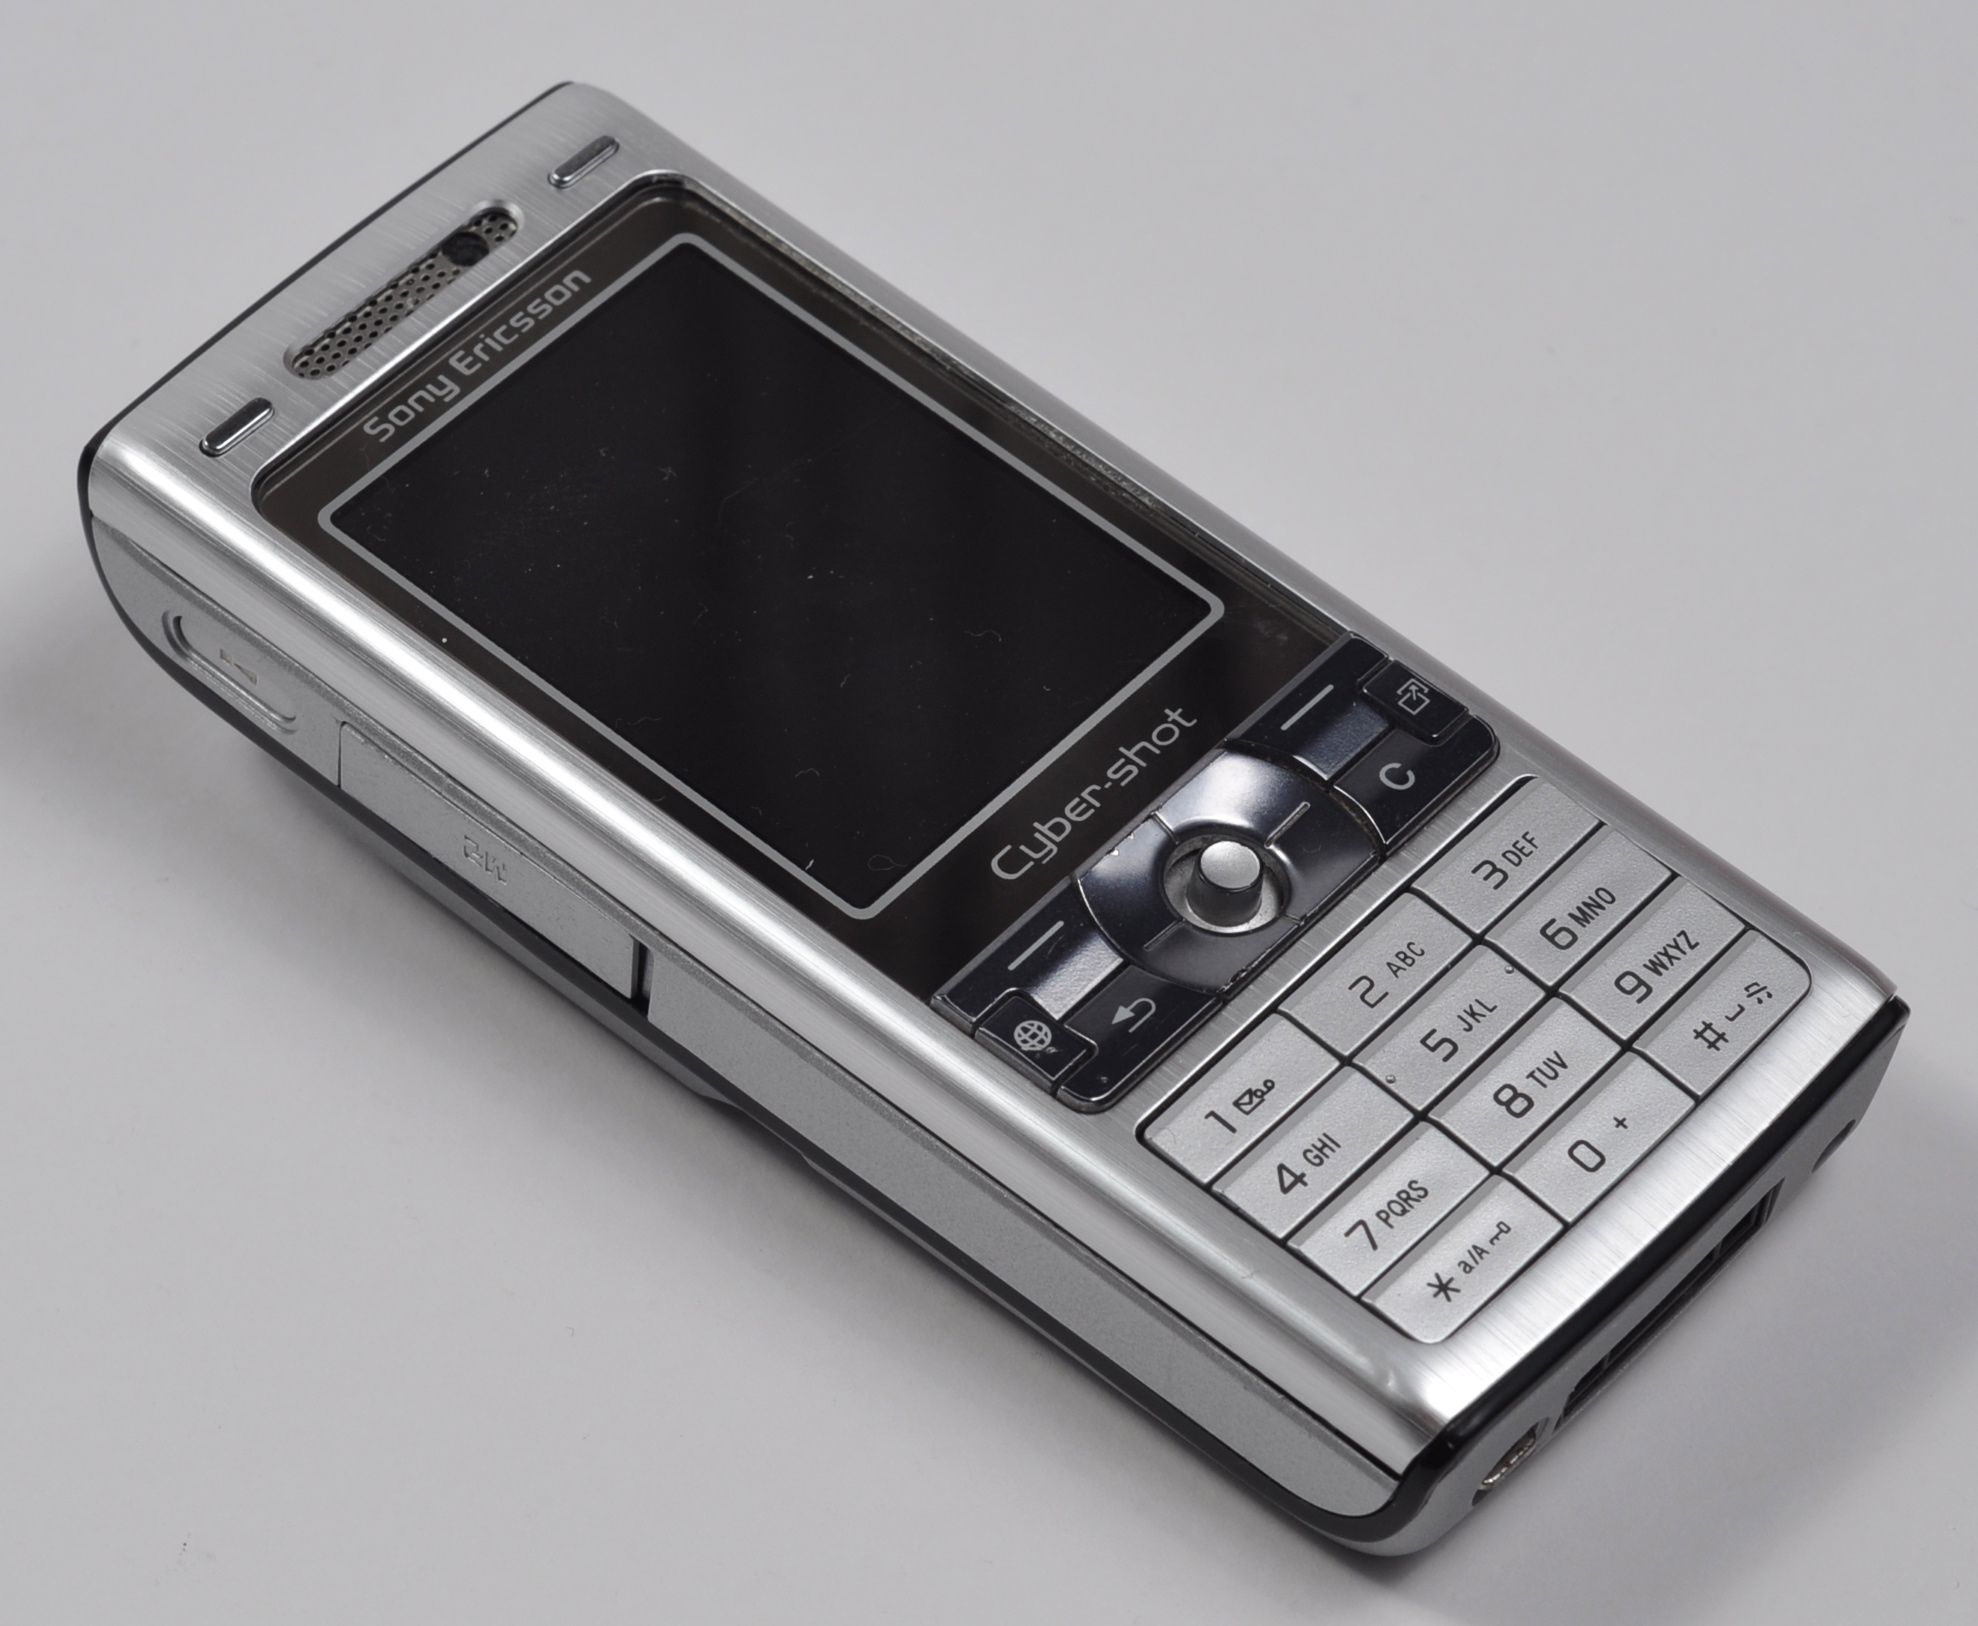 logiciel de sony ericsson k800i